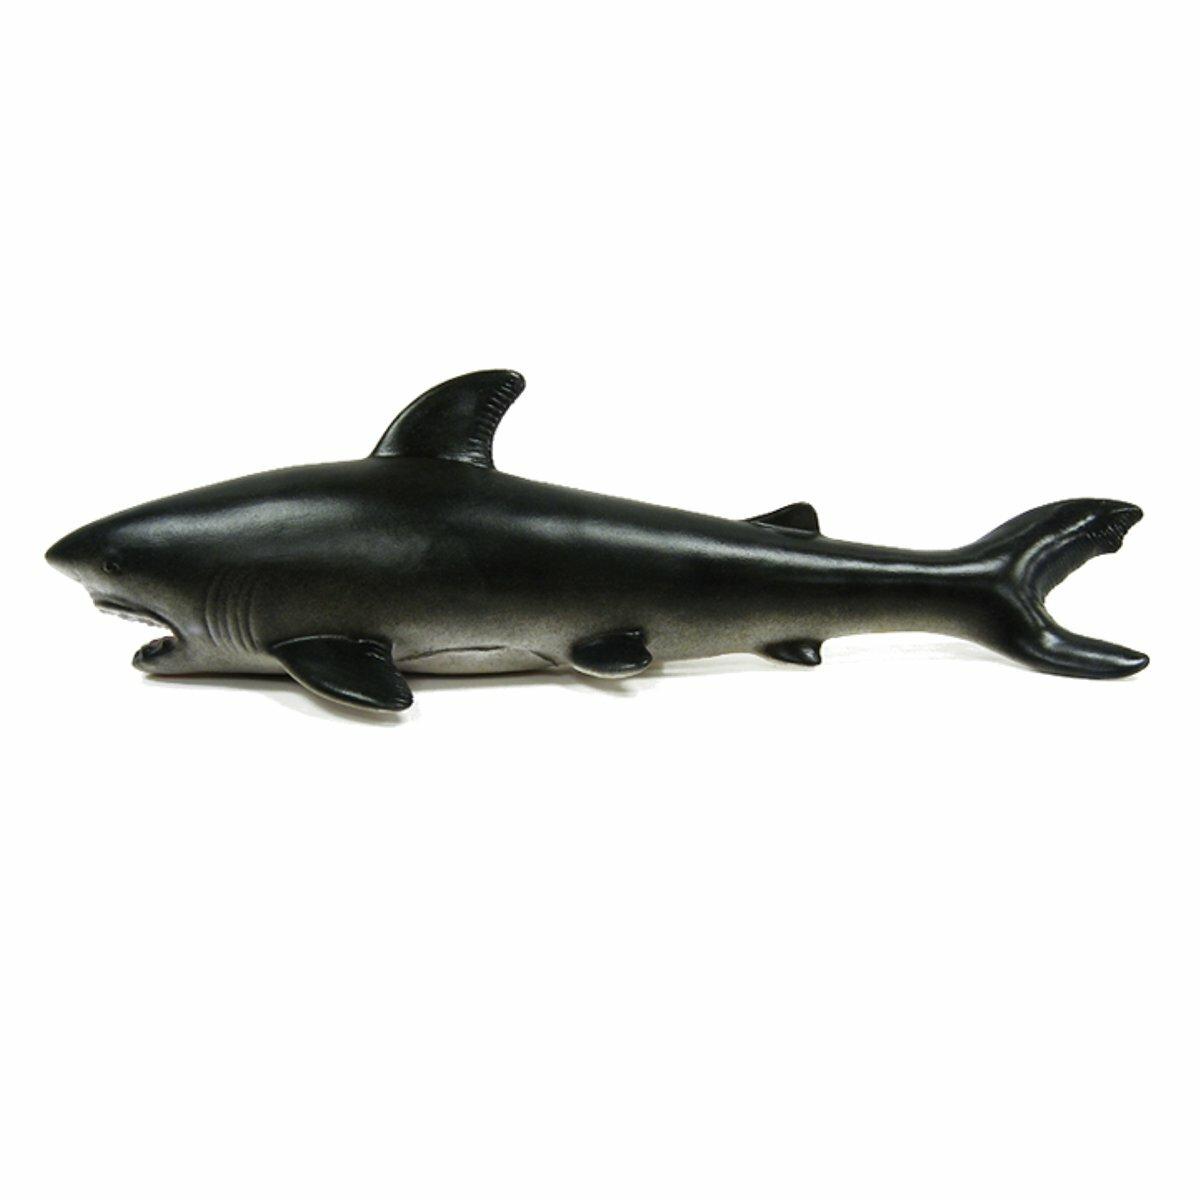 30cm Great White Shark Realistic Rubber Sea Animal Figure Toy Model